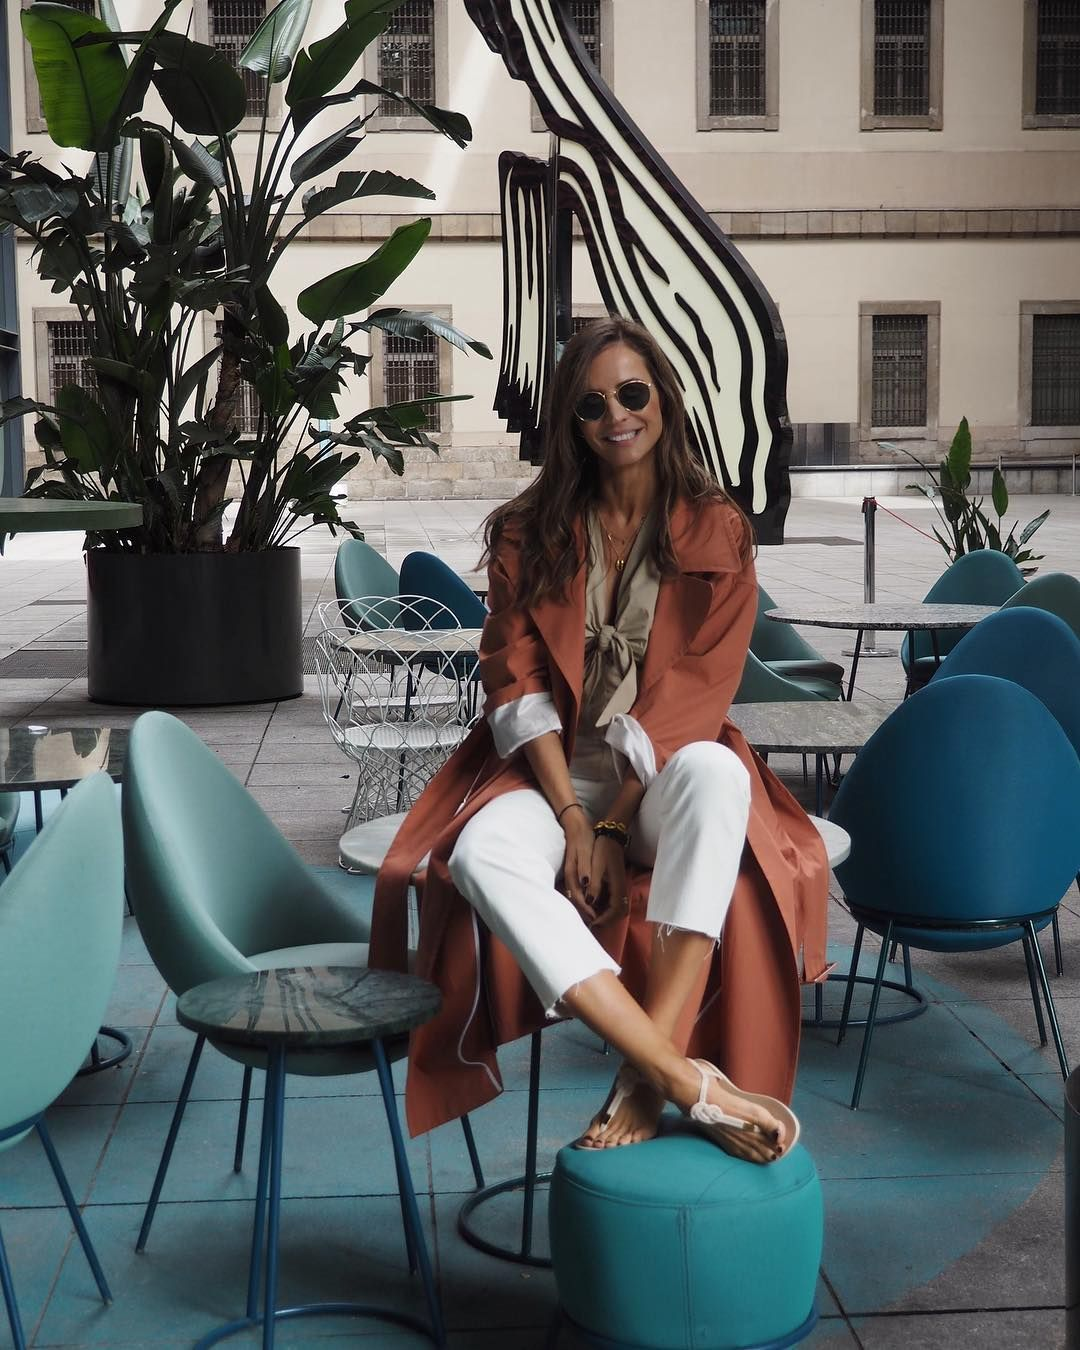 "10 Sortear Ladyaddict On Instagram""atentassPorque Ipanema A Va nPX80wOk"